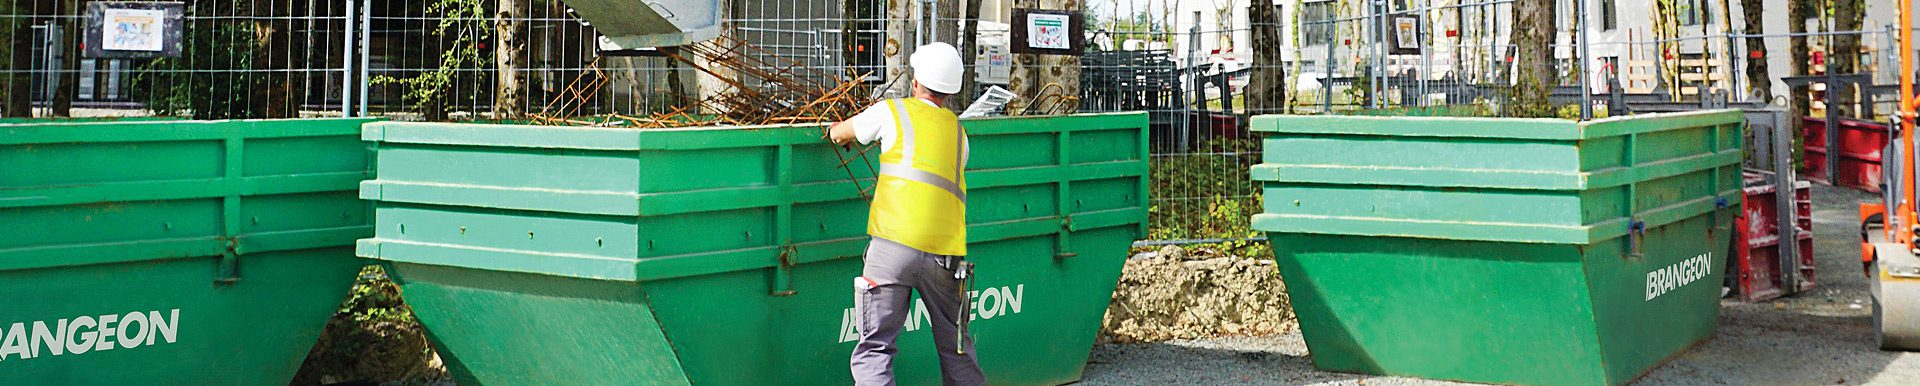 Brangeon Recyclage